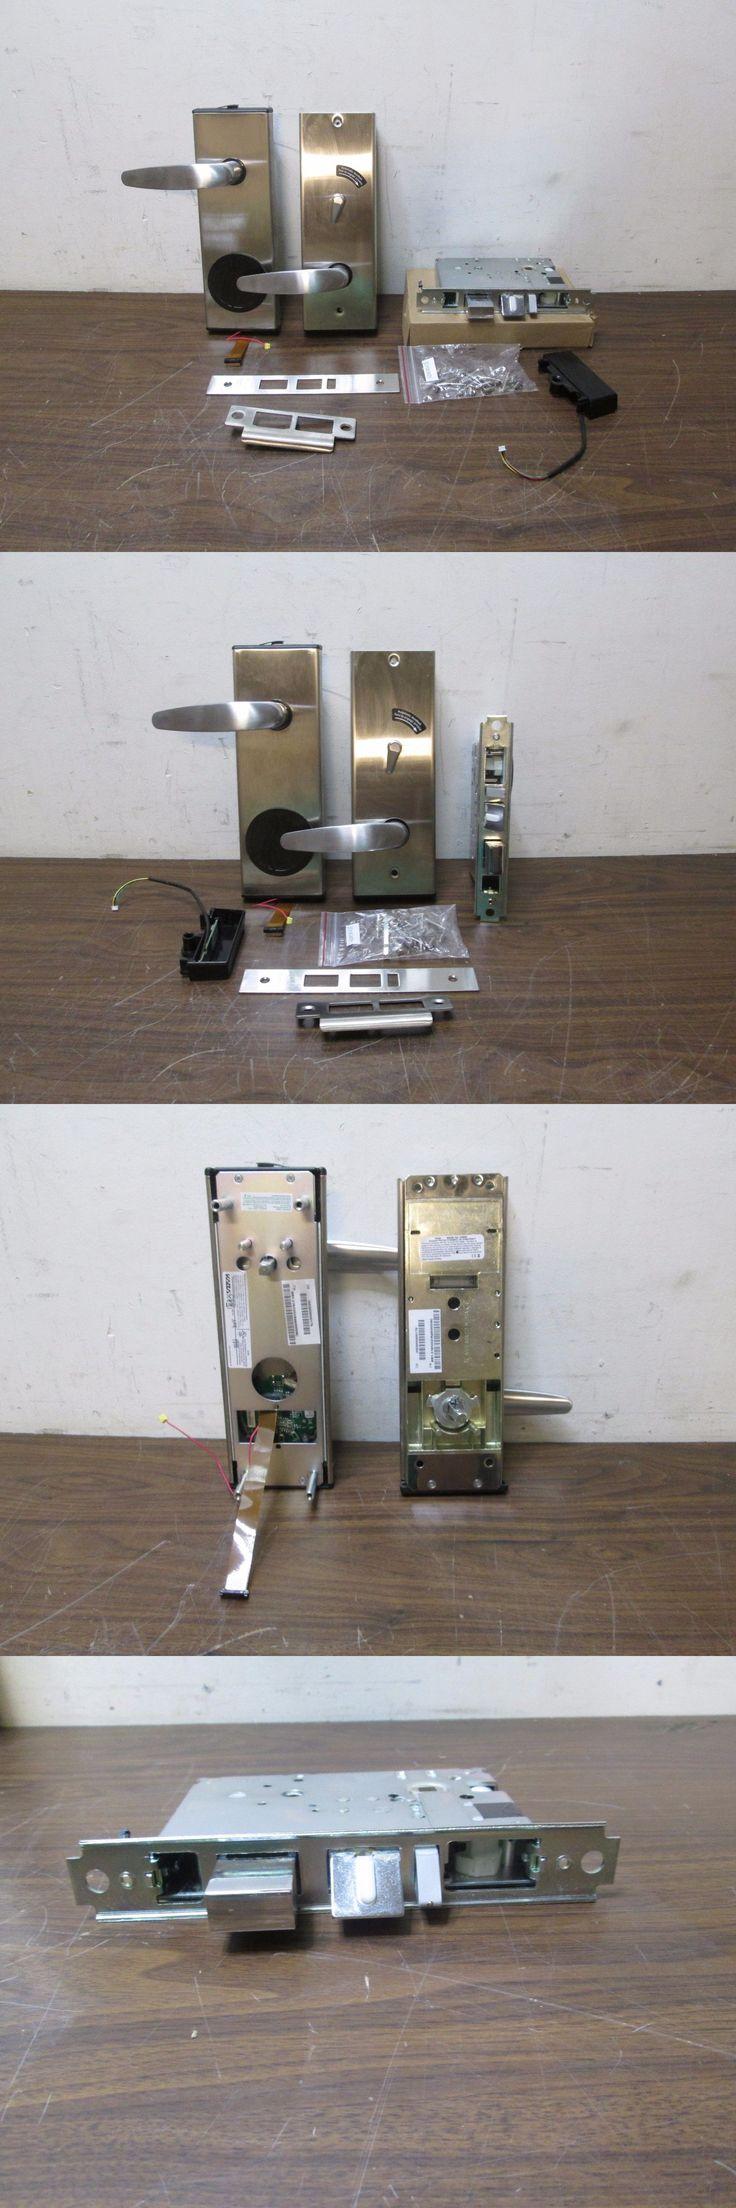 Door Locks and Lock Mechanisms 180966: Kaba Electronic Lock Mt Series Saflok W Rfid Card Reader Mr1-21Nc0g0ran0000sc -> BUY IT NOW ONLY: $249.99 on eBay!